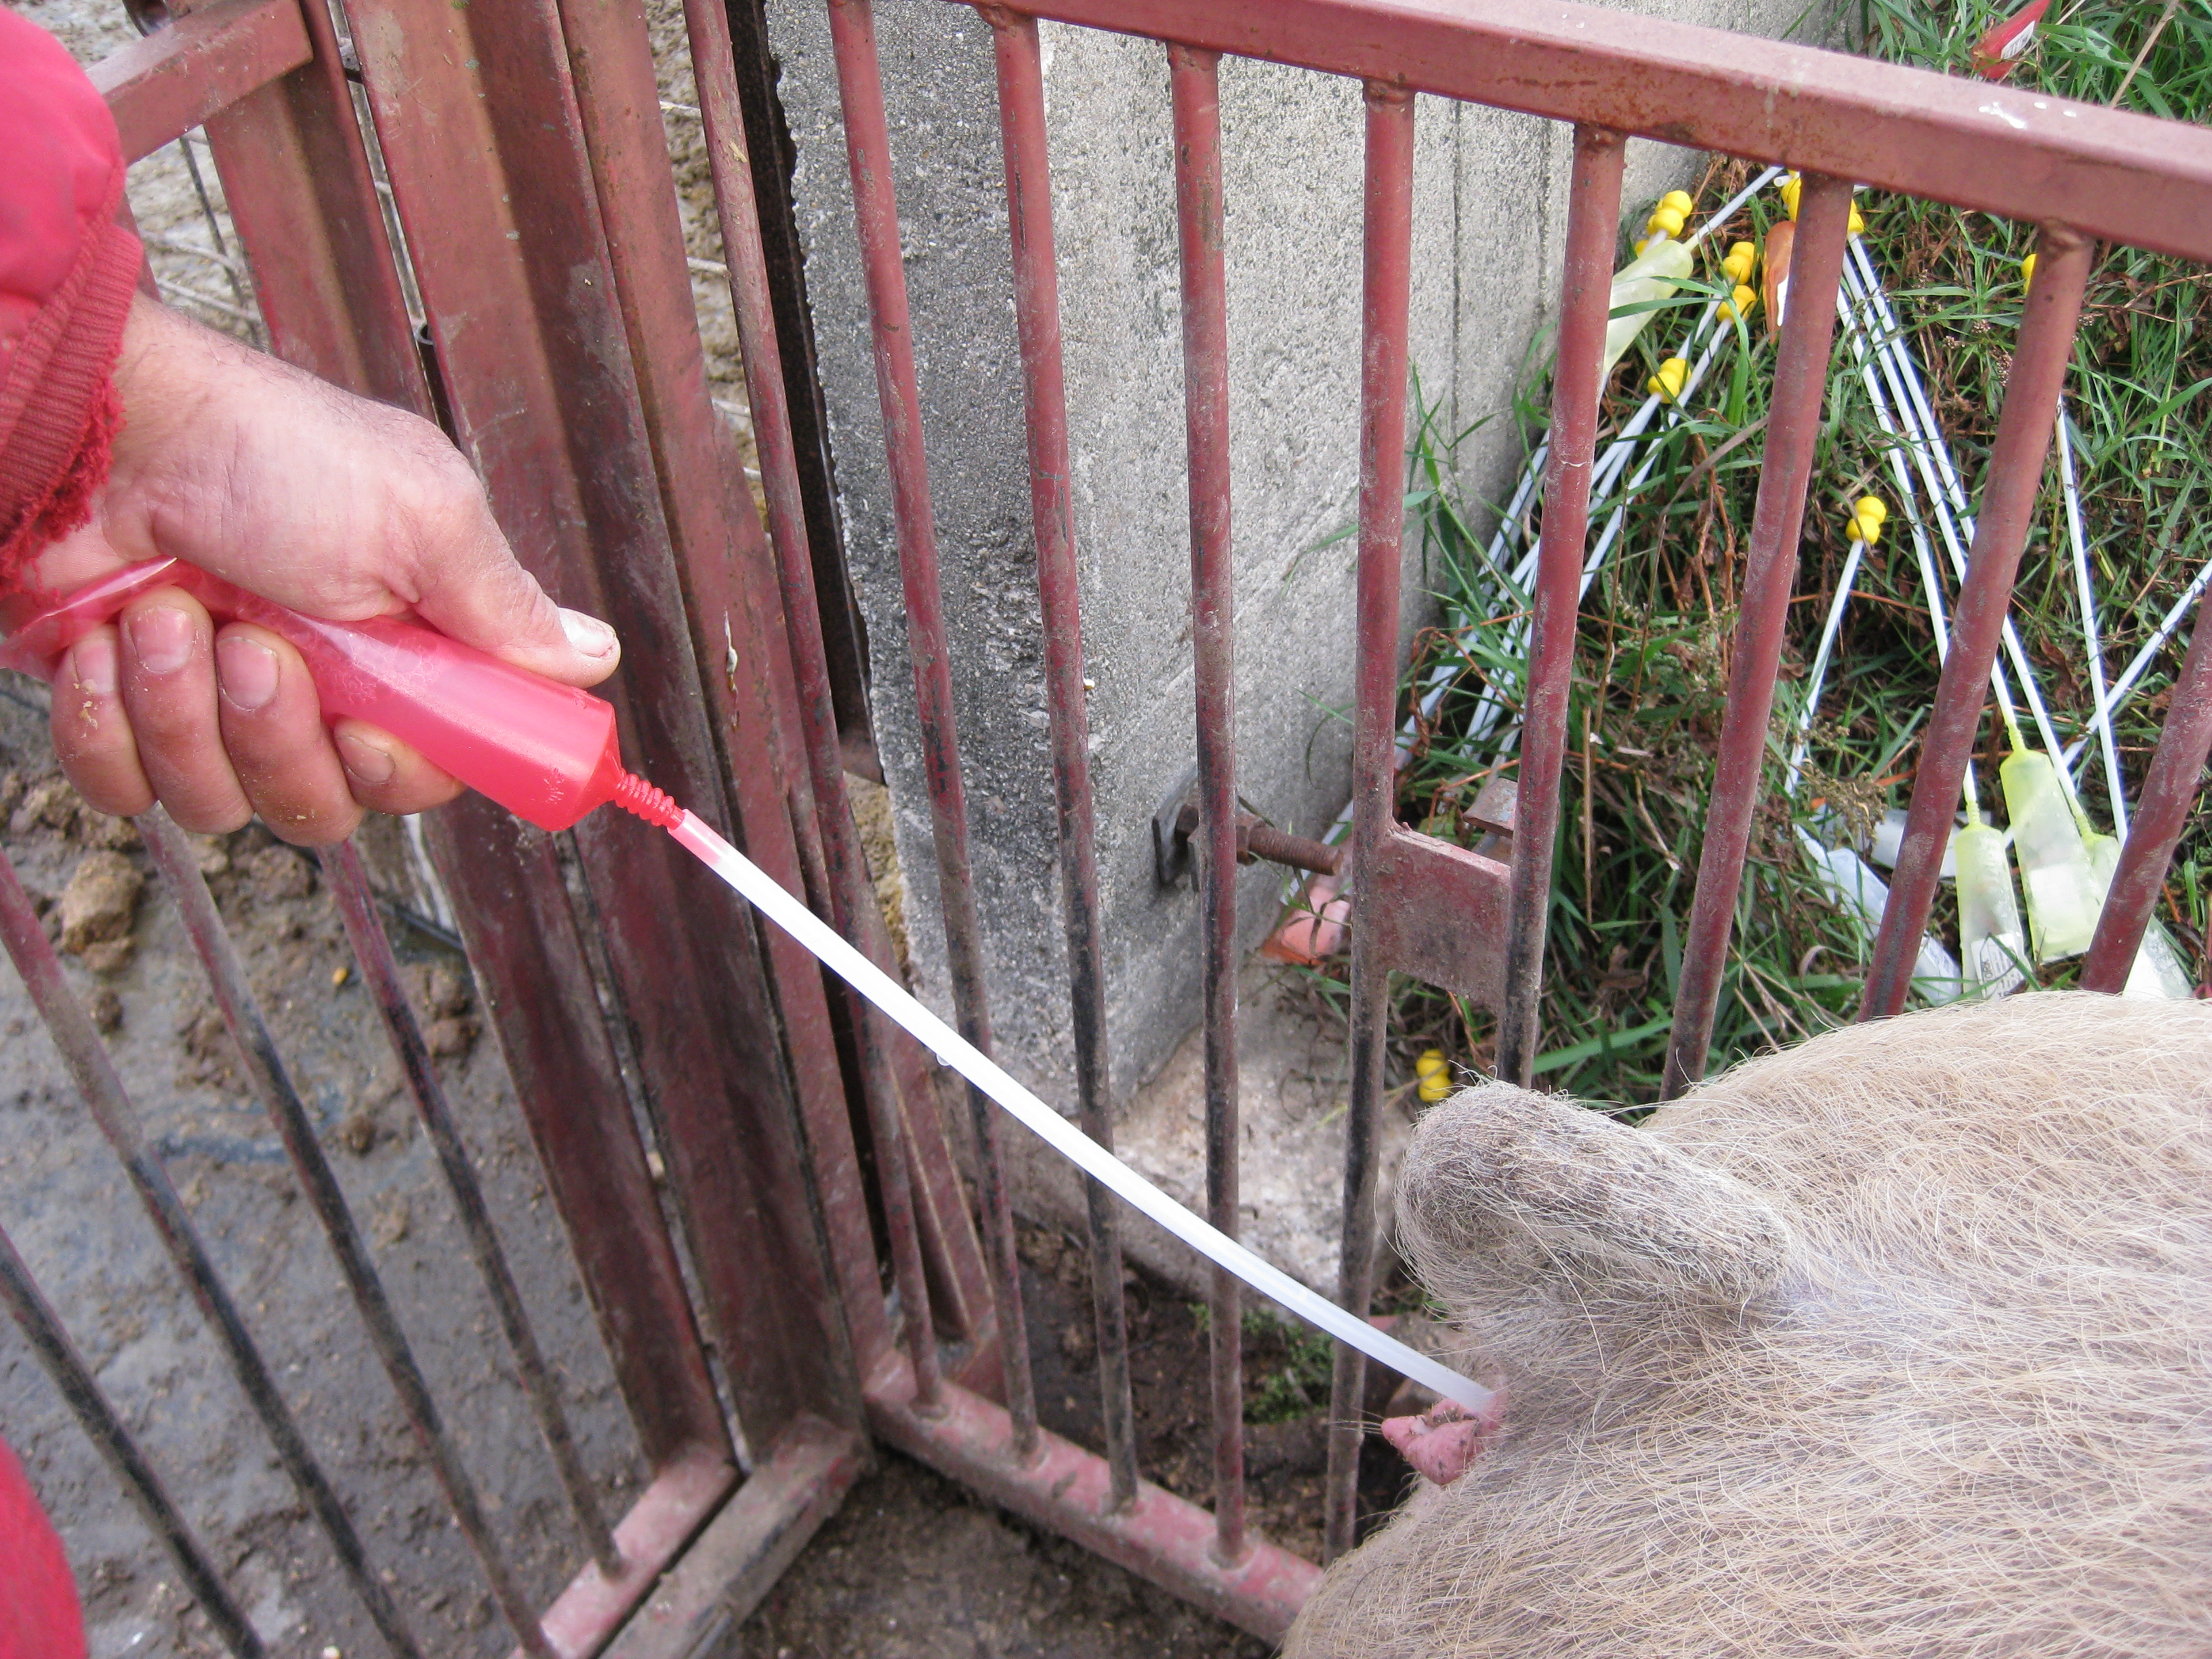 Swine Artificial Insemination AI Foam Breeding Rod Insert w// Handle Sow 5 Count